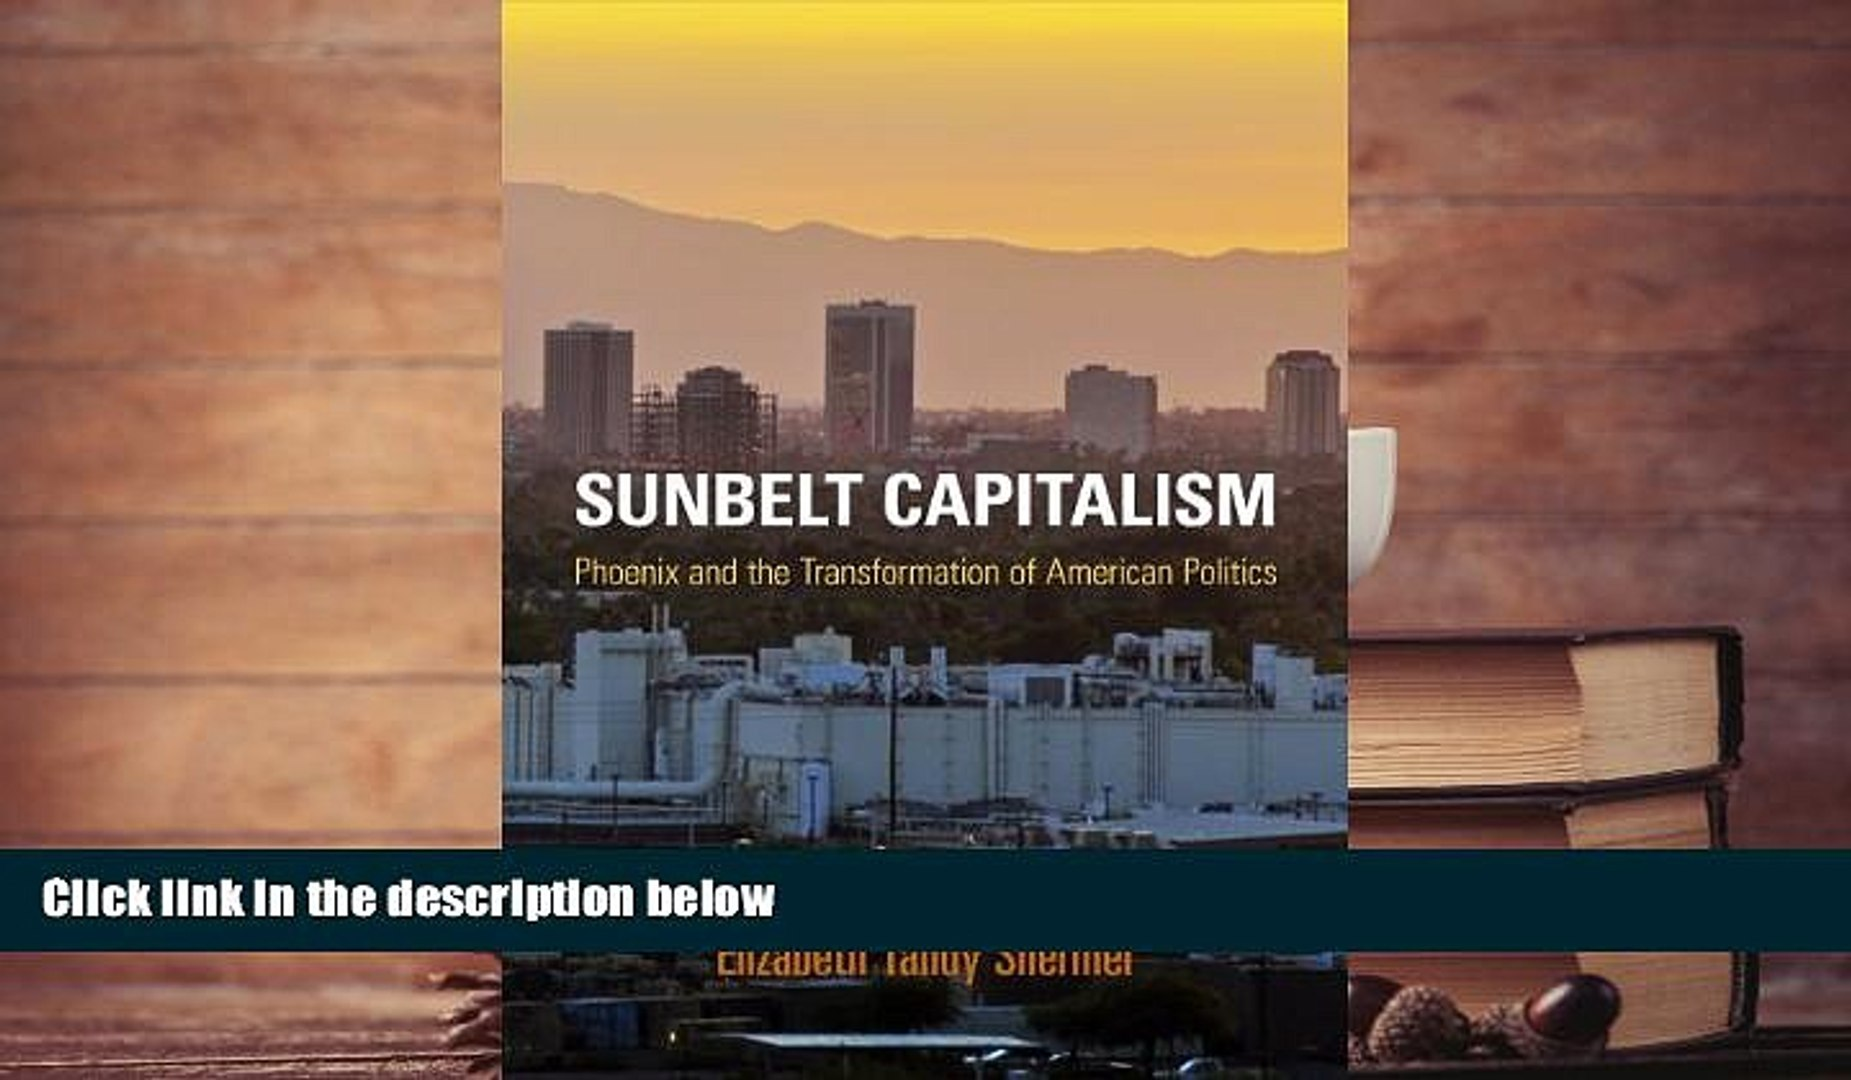 Best Price Sunbelt Capitalism: Phoenix and the Transformation of American Politics (Politics and